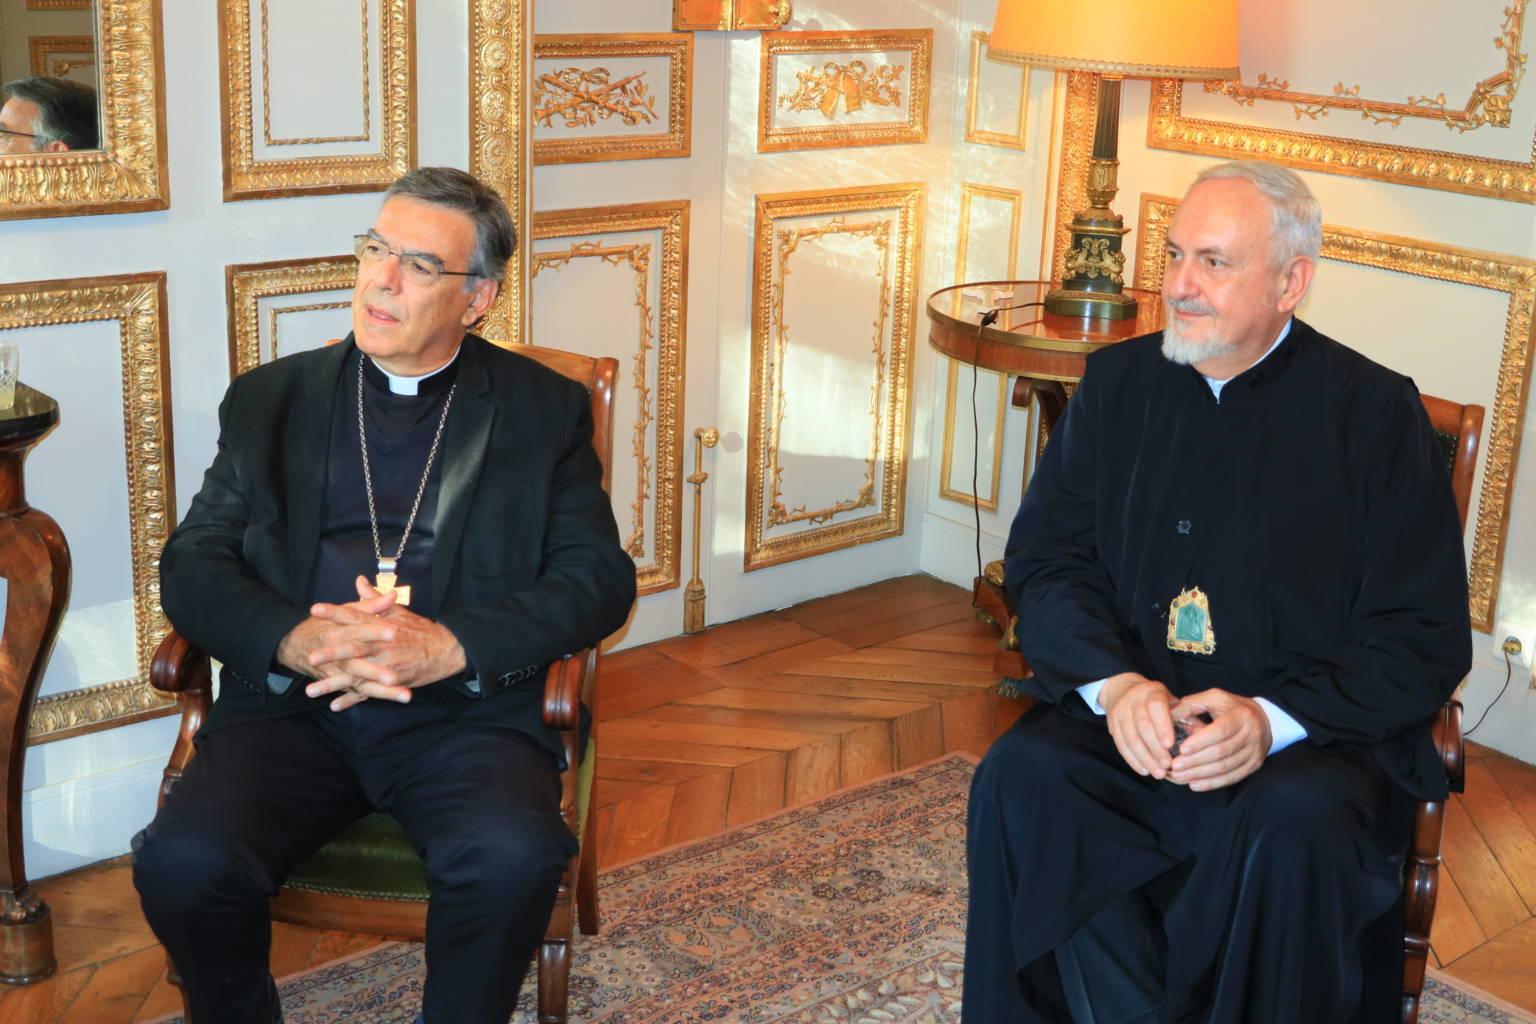 IMG 0301 - Συνάντηση του Μητροπολίτη Γαλλίας με τον ΡωμαιοκαθολικόΑρχιεπίσκοπο Παρισίων